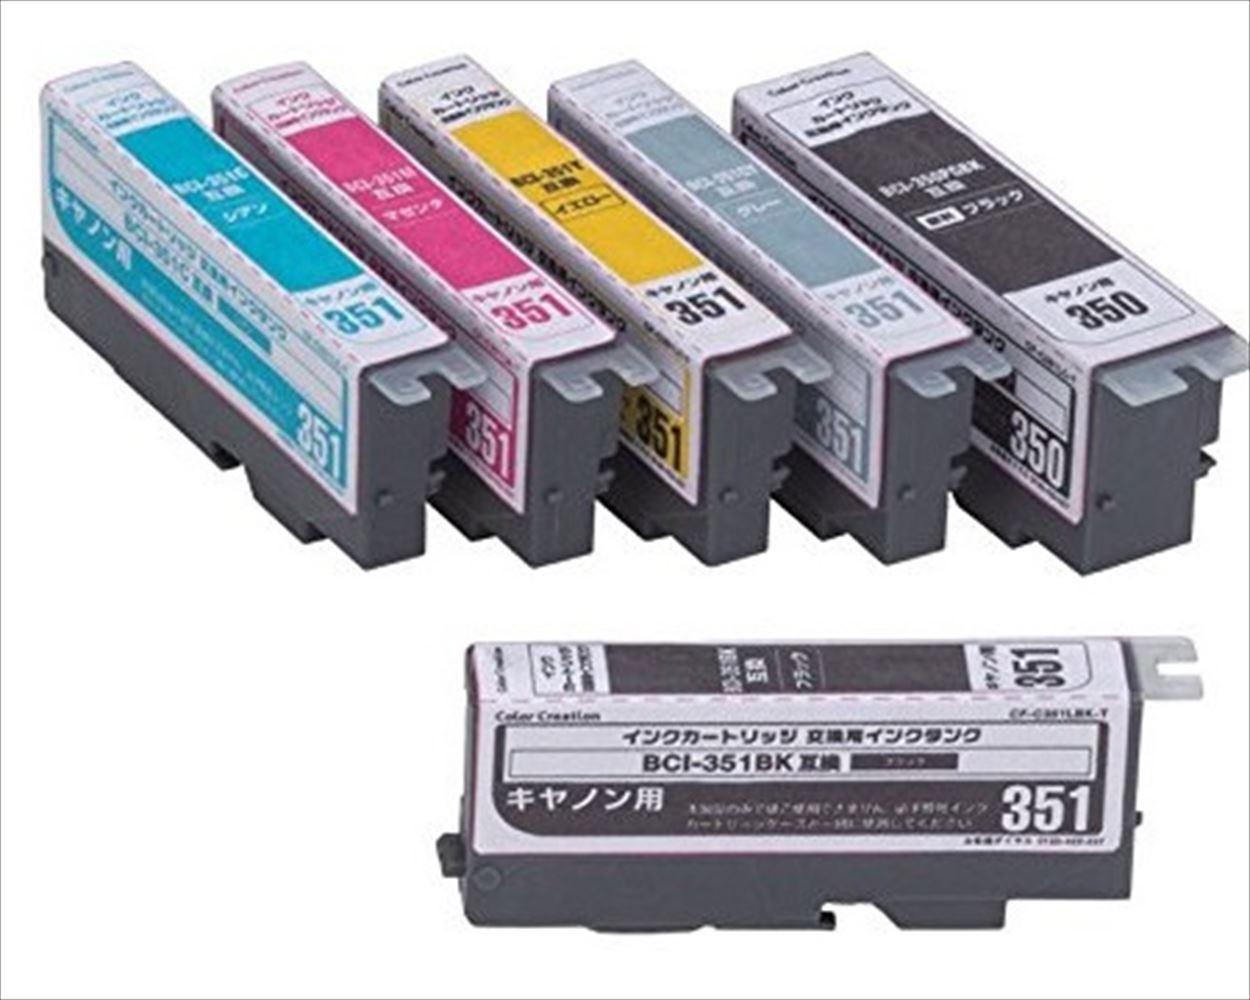 Color Creation キャノン BCI-350351互換 交換用インクタンク 6色パック CF-C351XL/6P-TS[メール便発送、送料無料、代引不可]【YDKG-kd】【smtb-KD】[プリンター][消耗品]